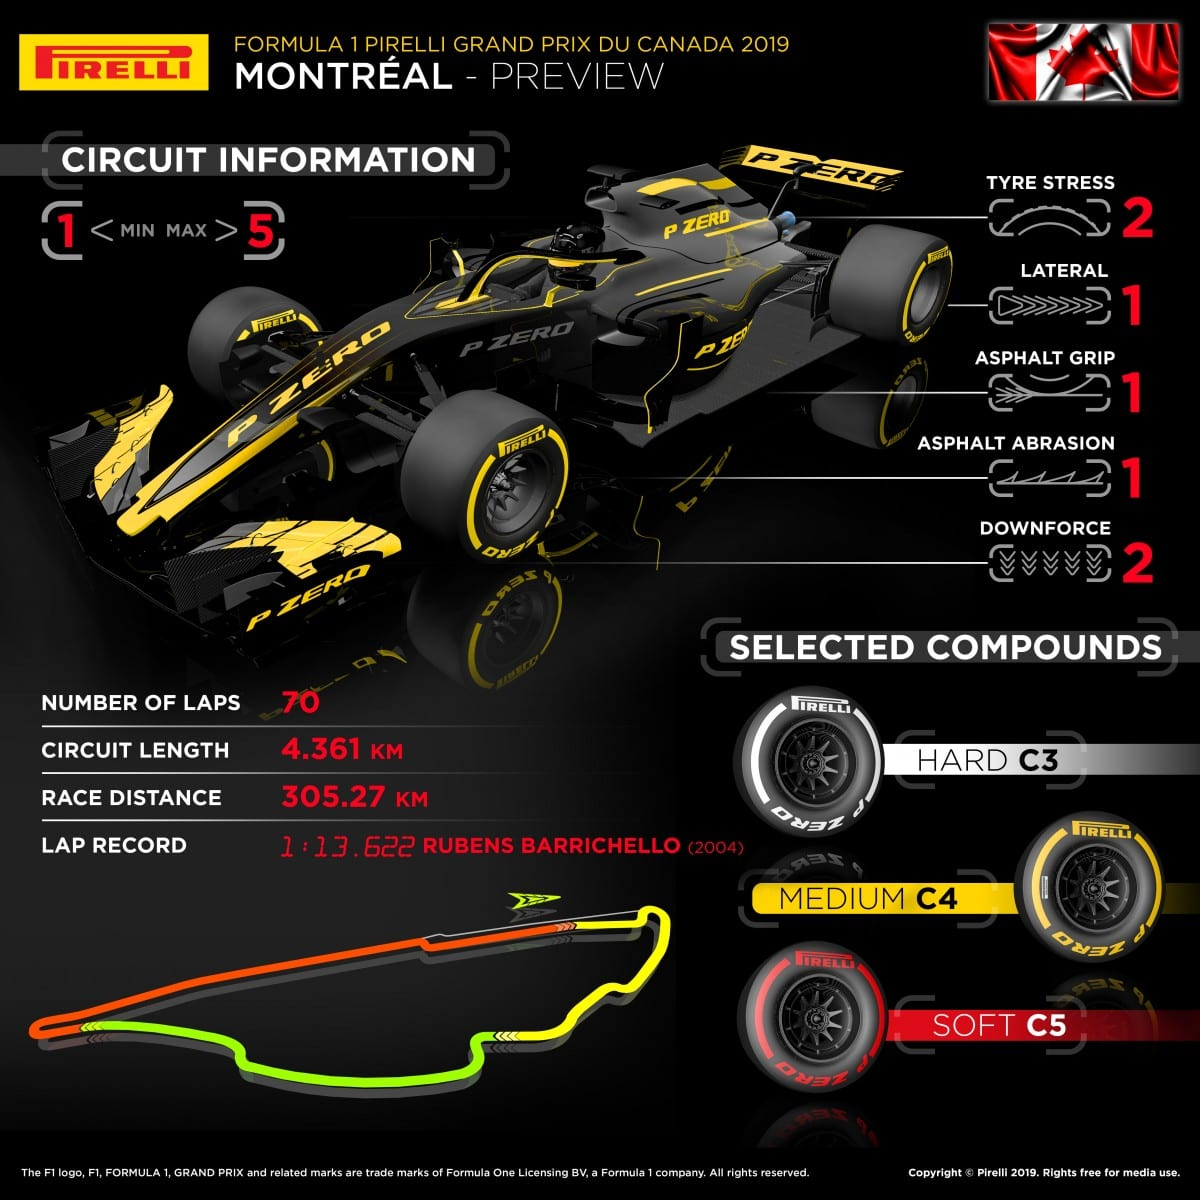 Pirelli's take on Montréal's F1 Grand Prix